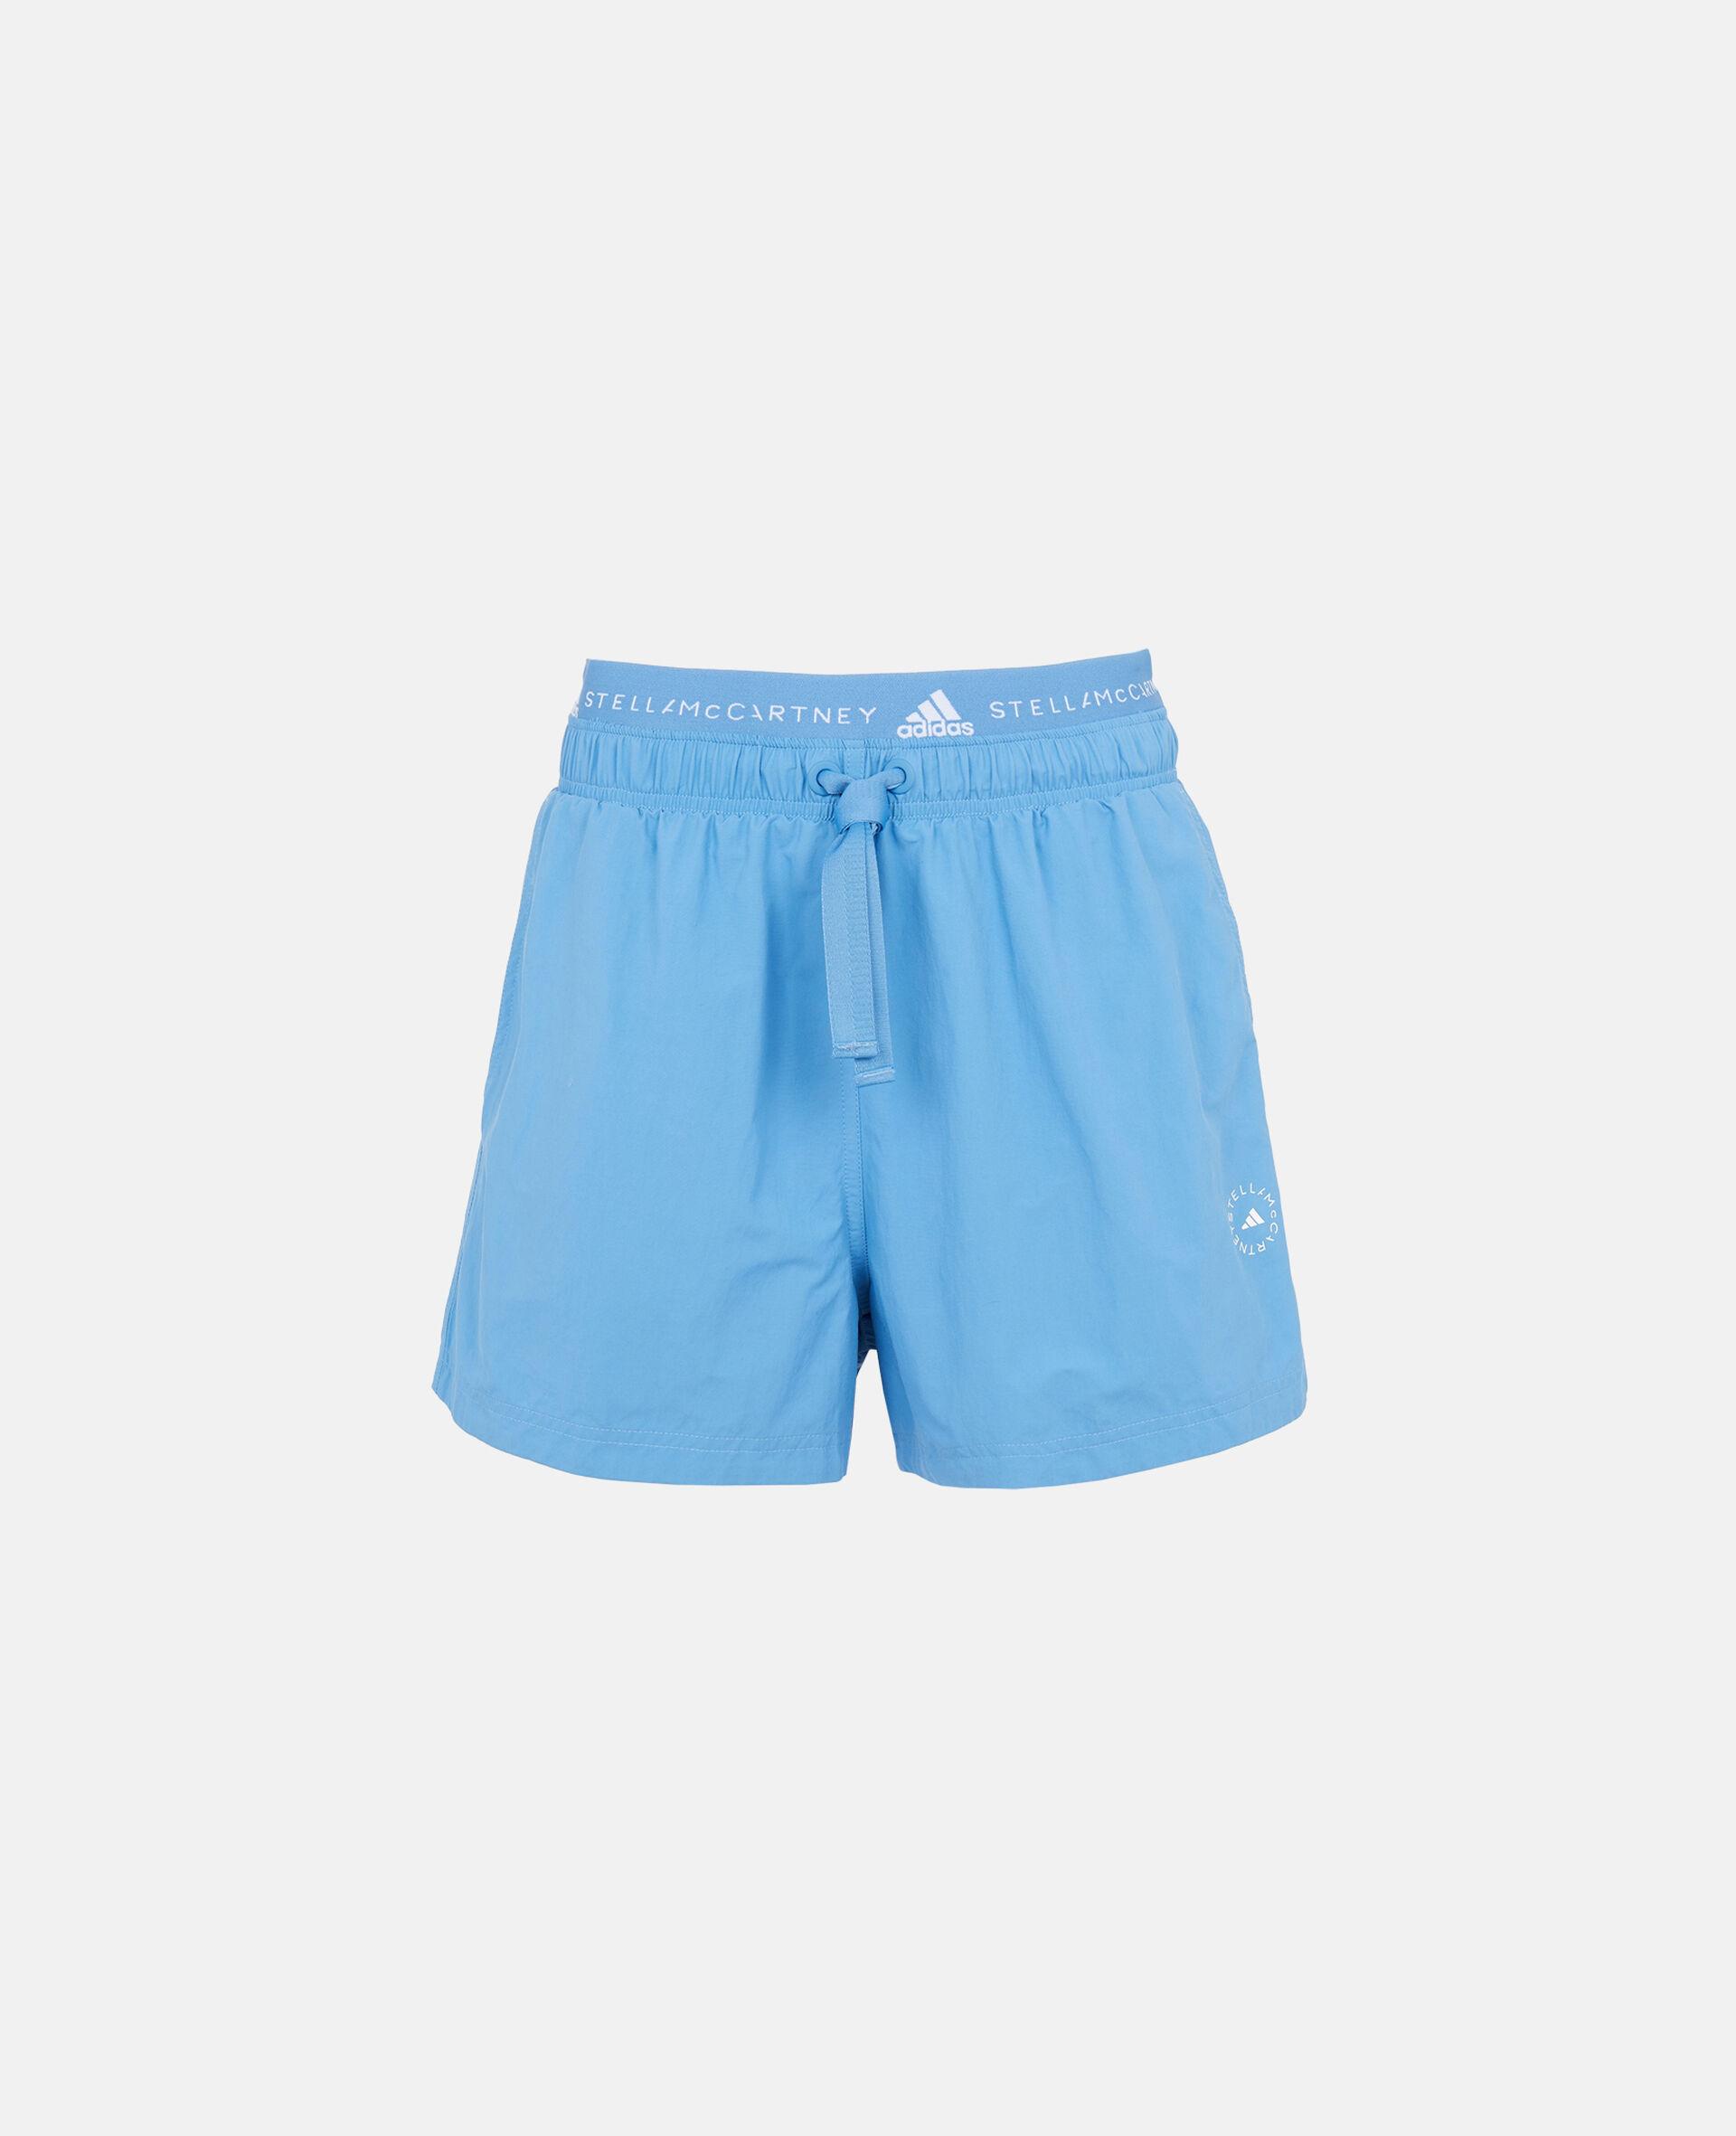 Blue Woven Shorts -Blue-large image number 0